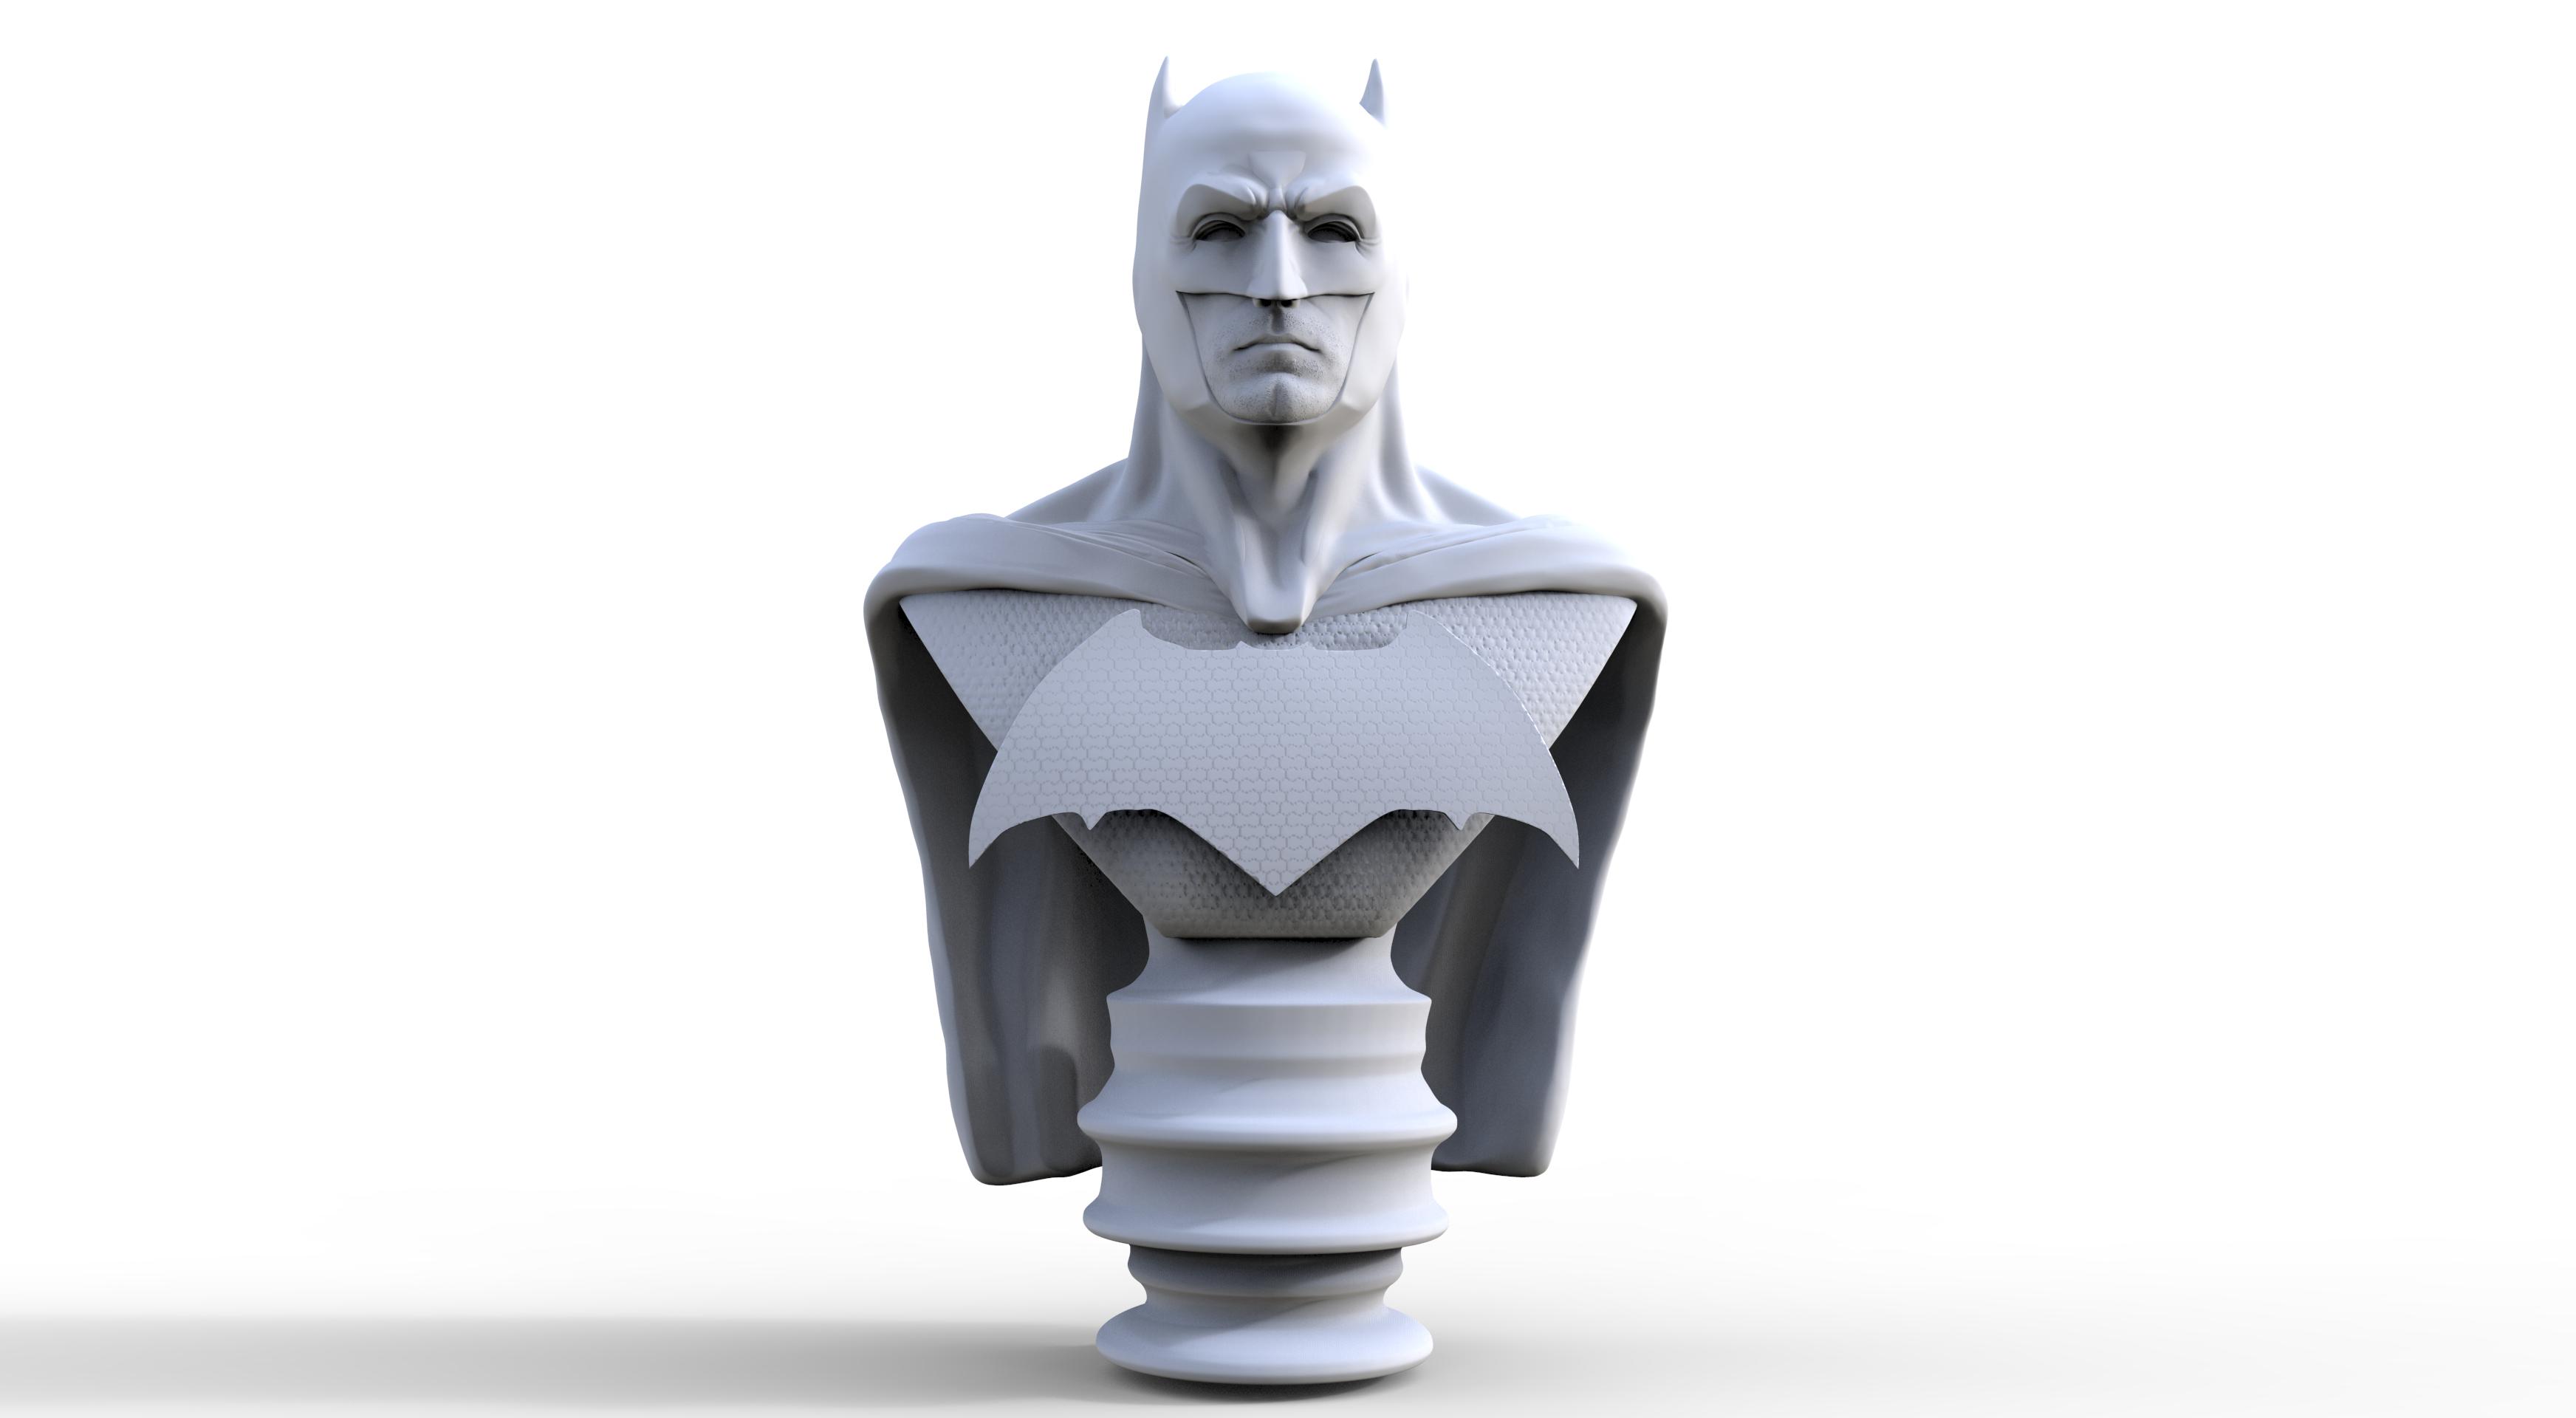 batman_render2